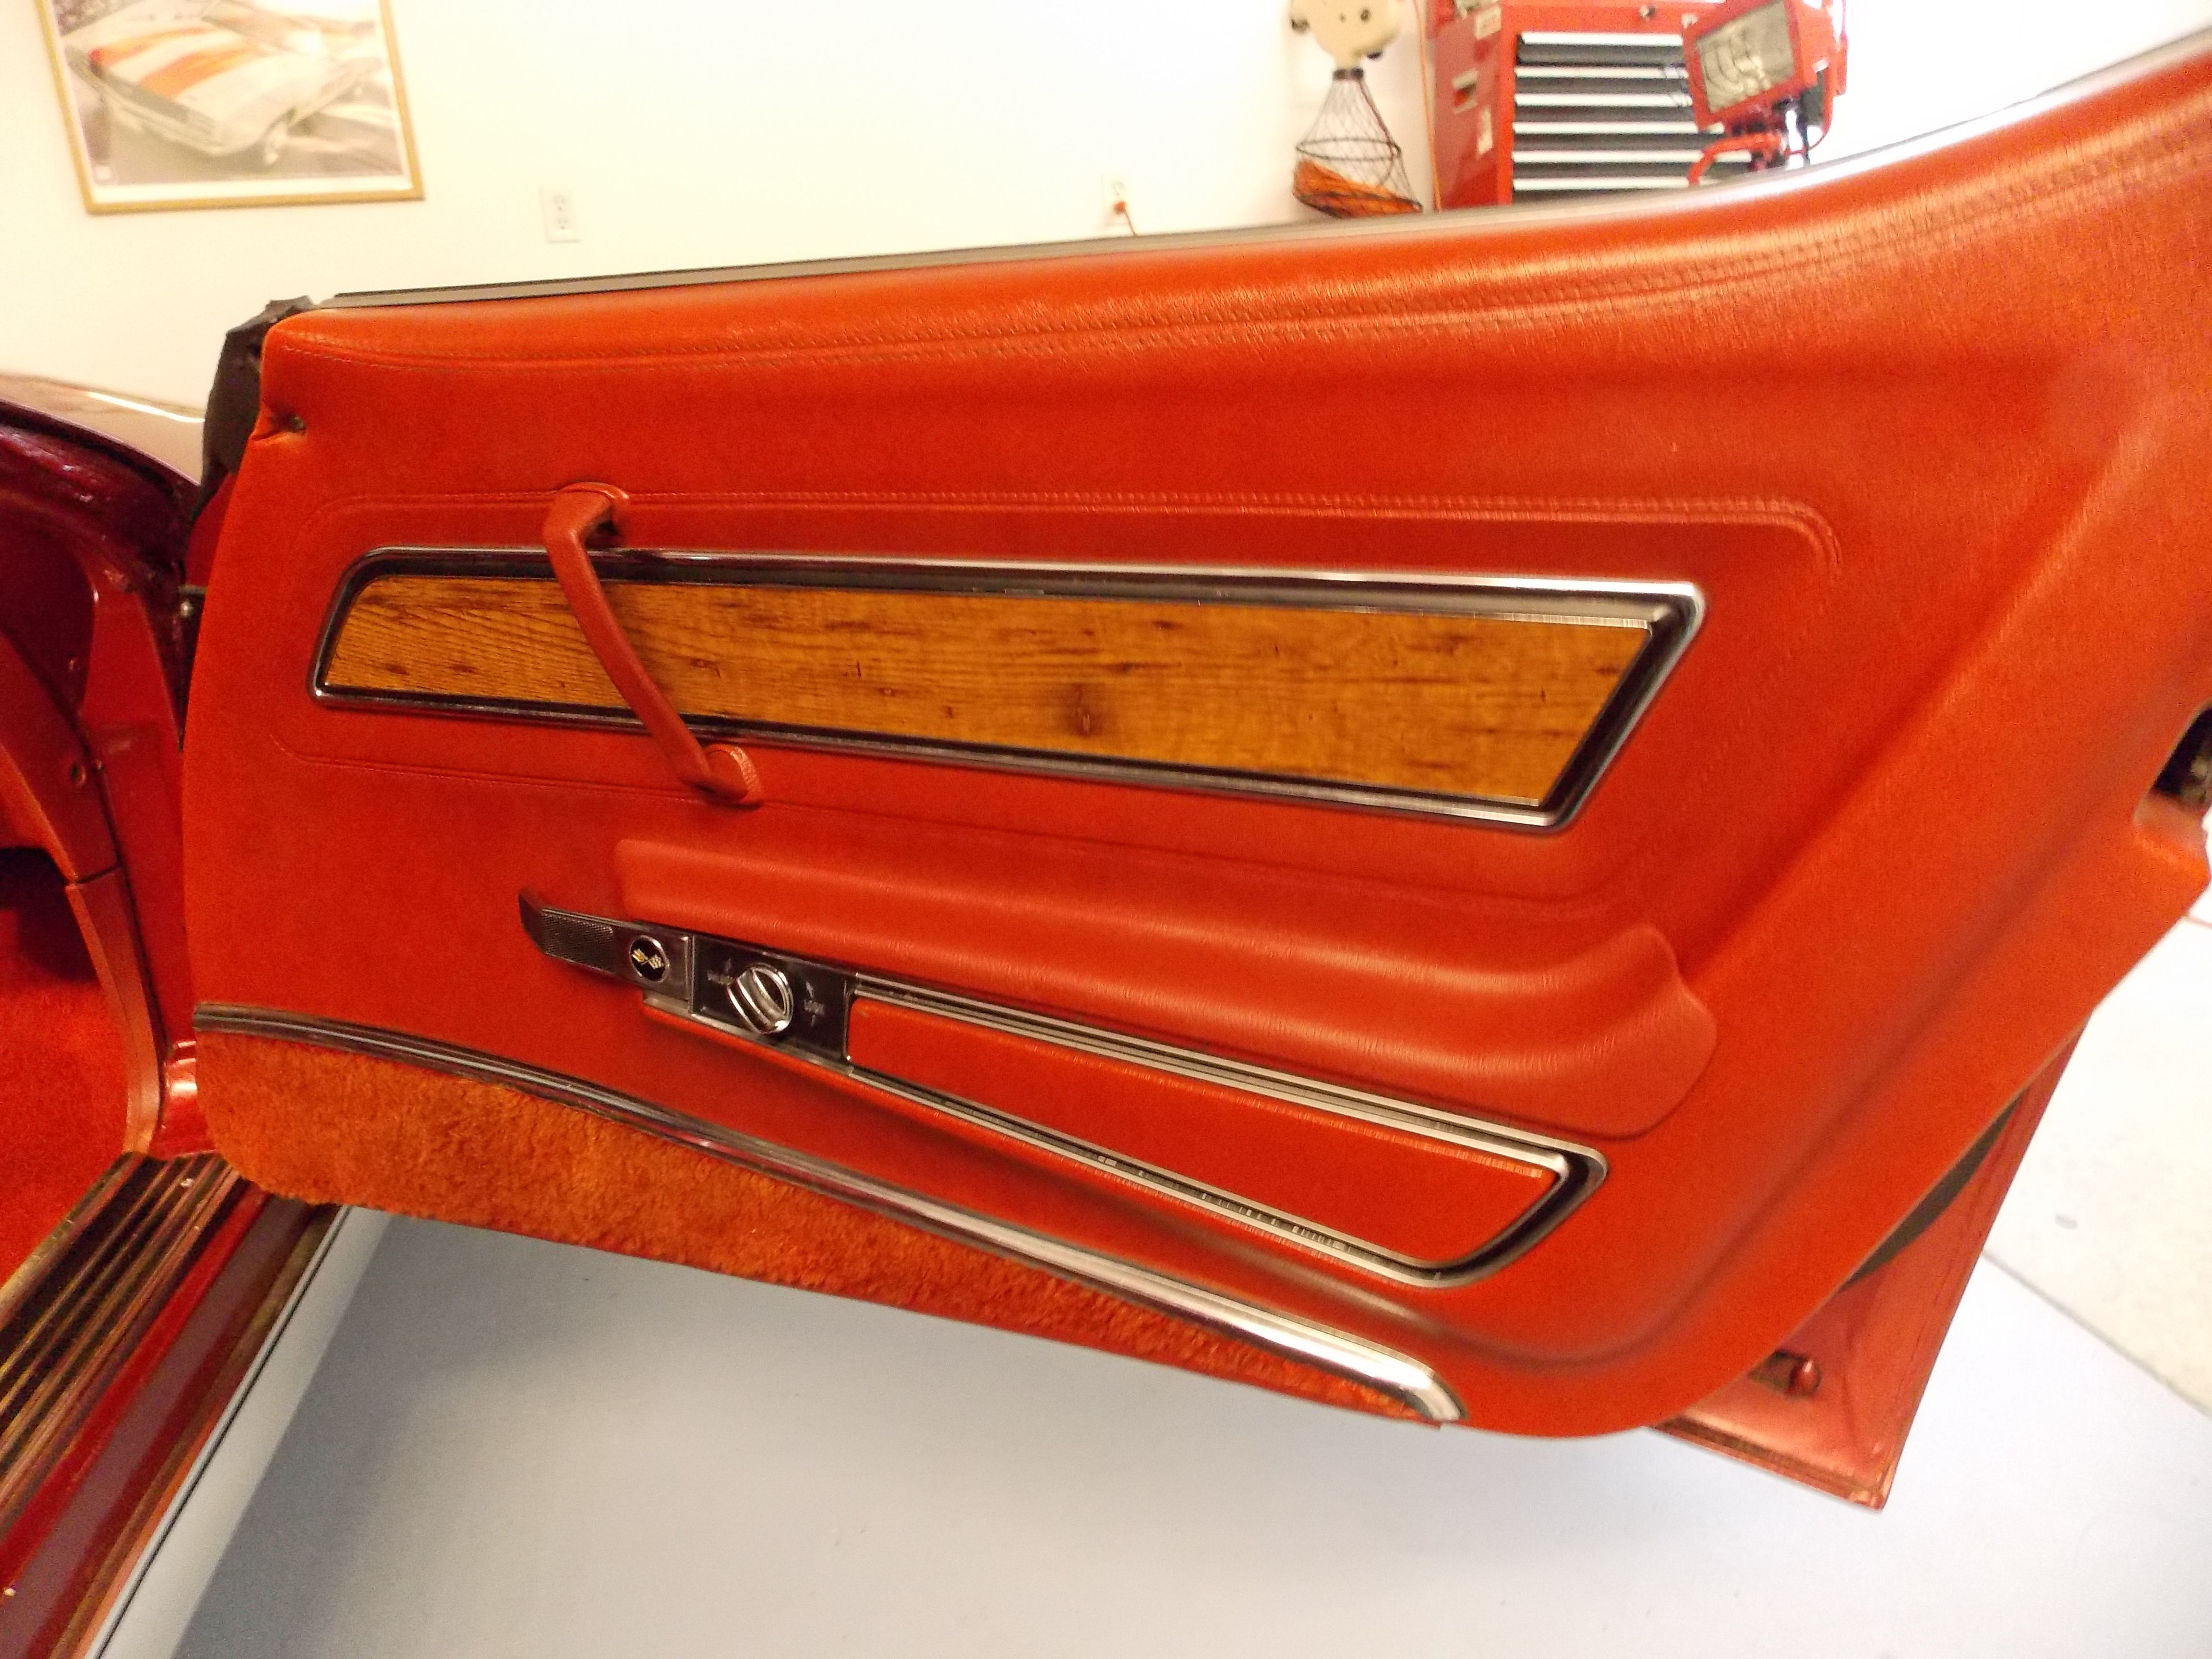 76 corvette | 1976 Red/Red Corvette Sales - Corvette, Camaro, Chevelle, Chevy Nova ...